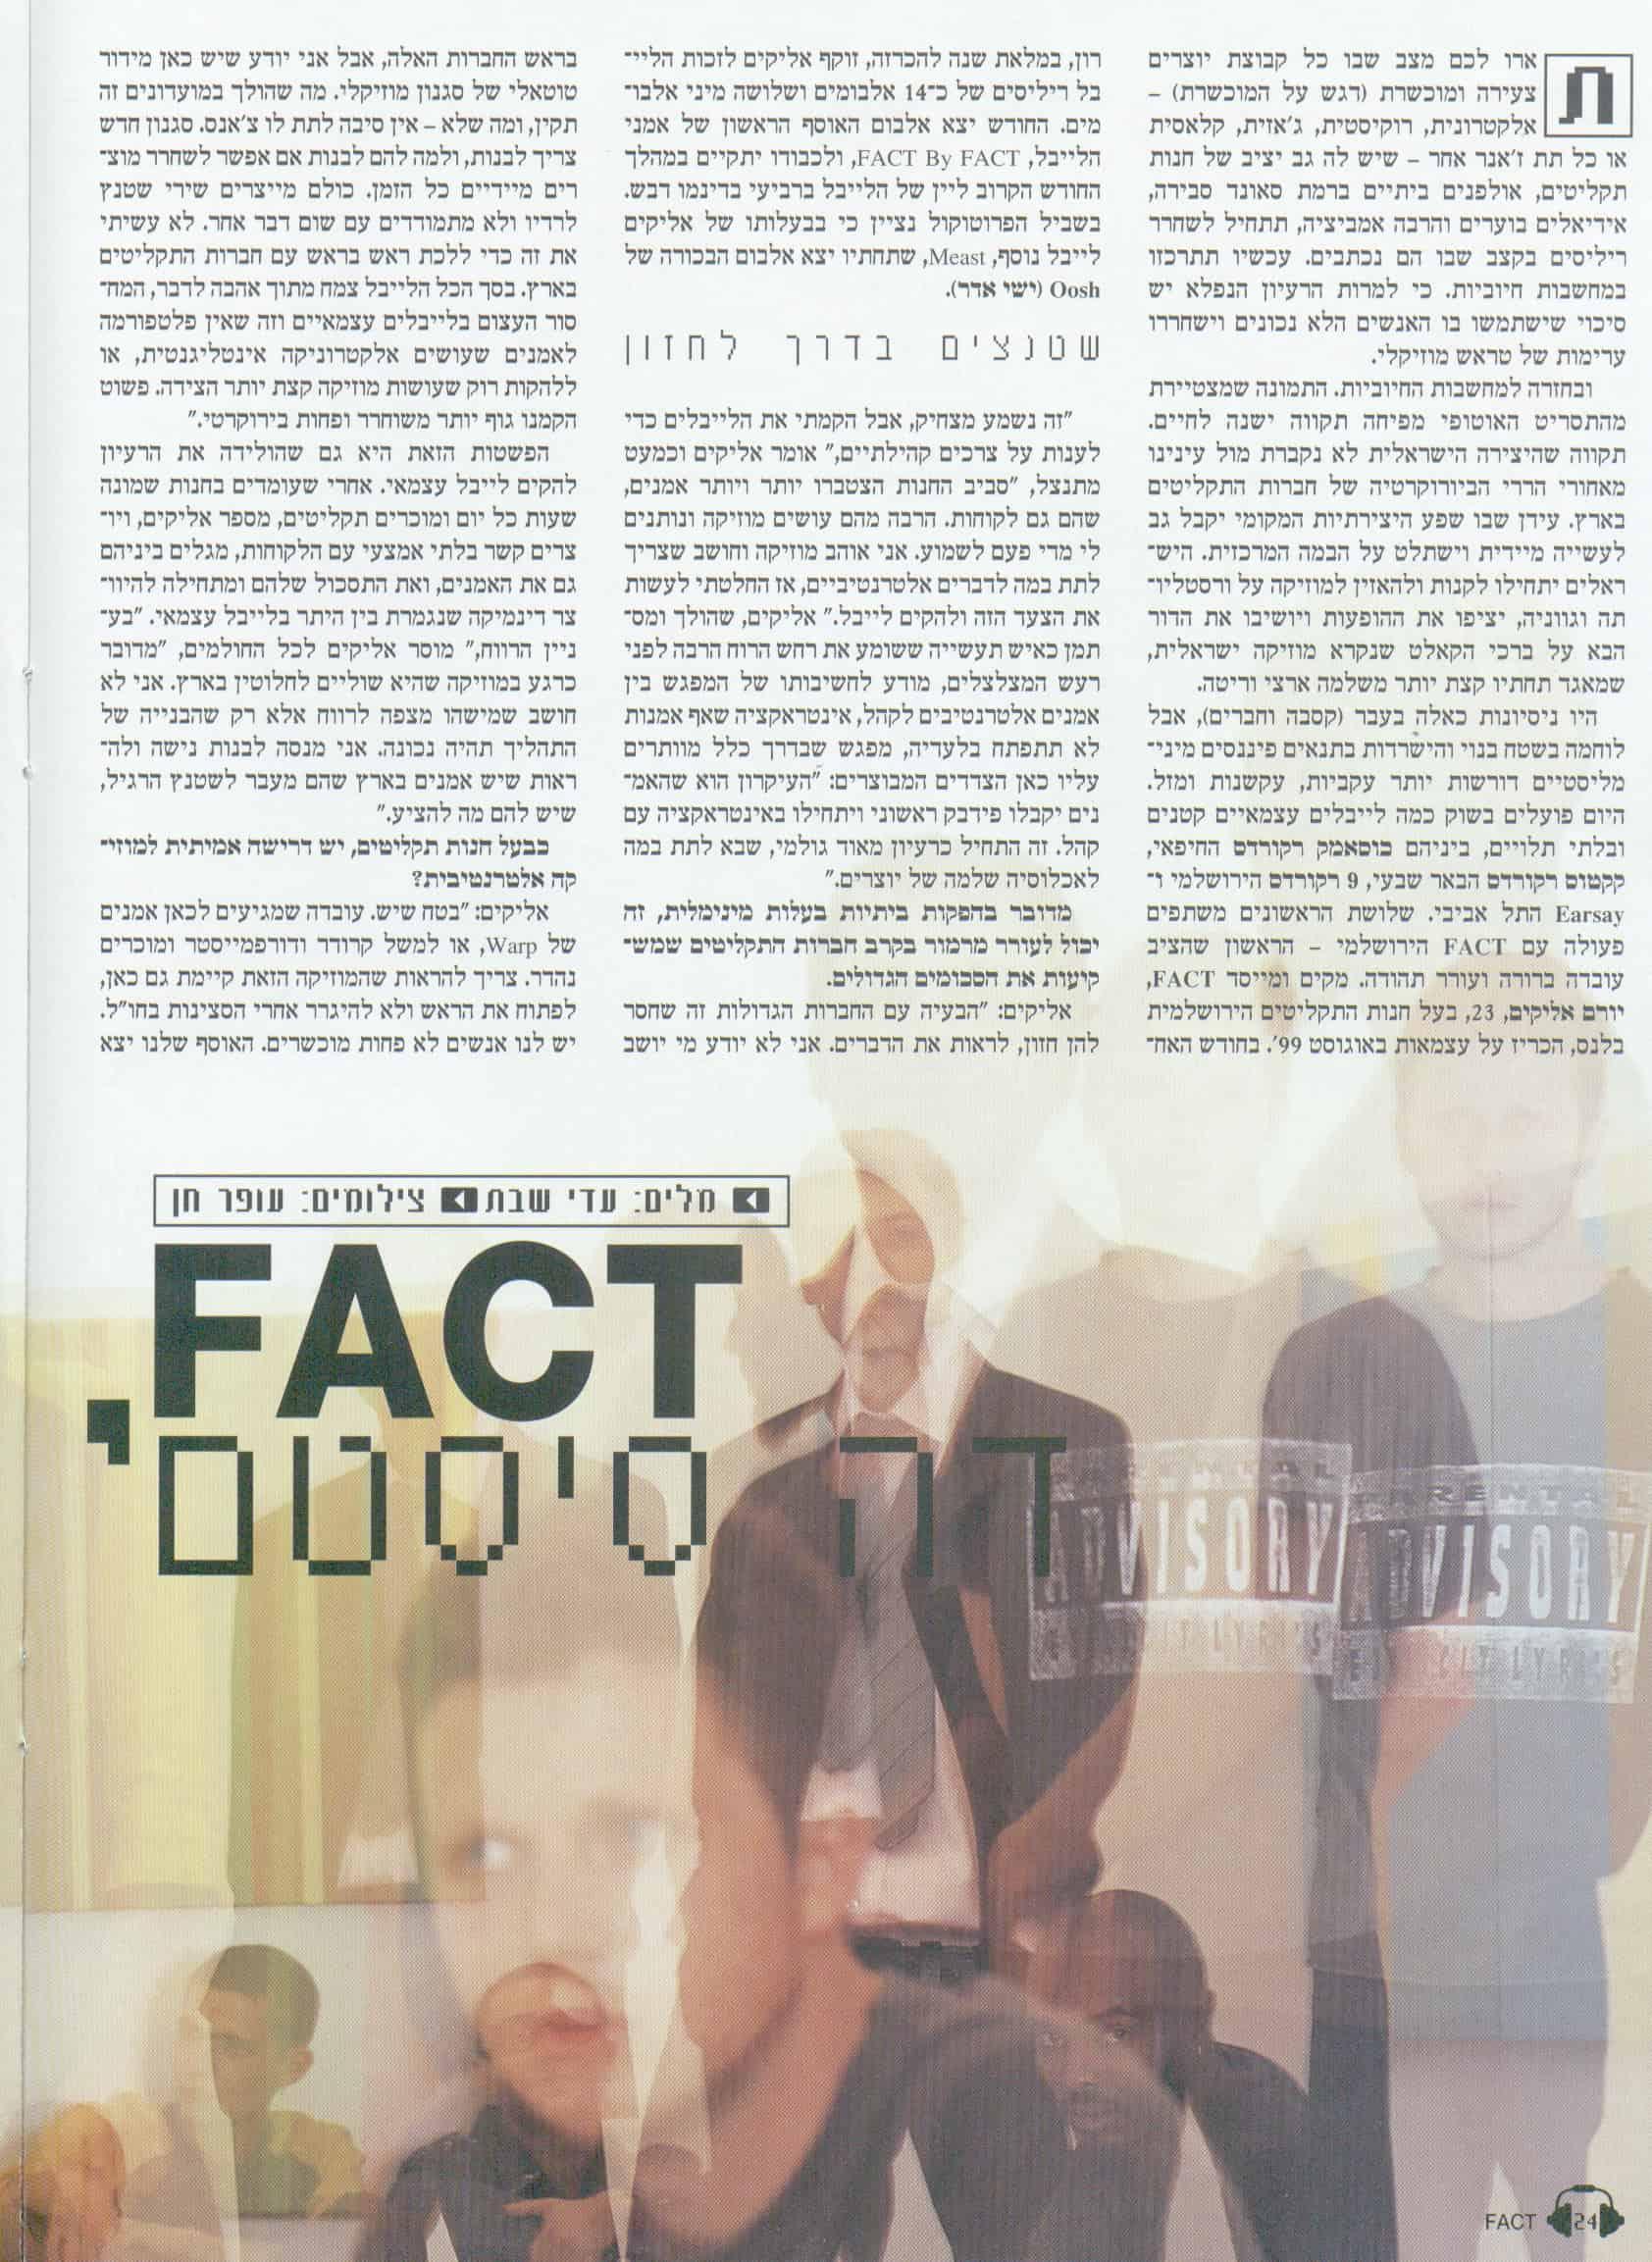 dj2 - Avuz Electroni, DJ Ha-Ir, Fact records, 06.02.2001